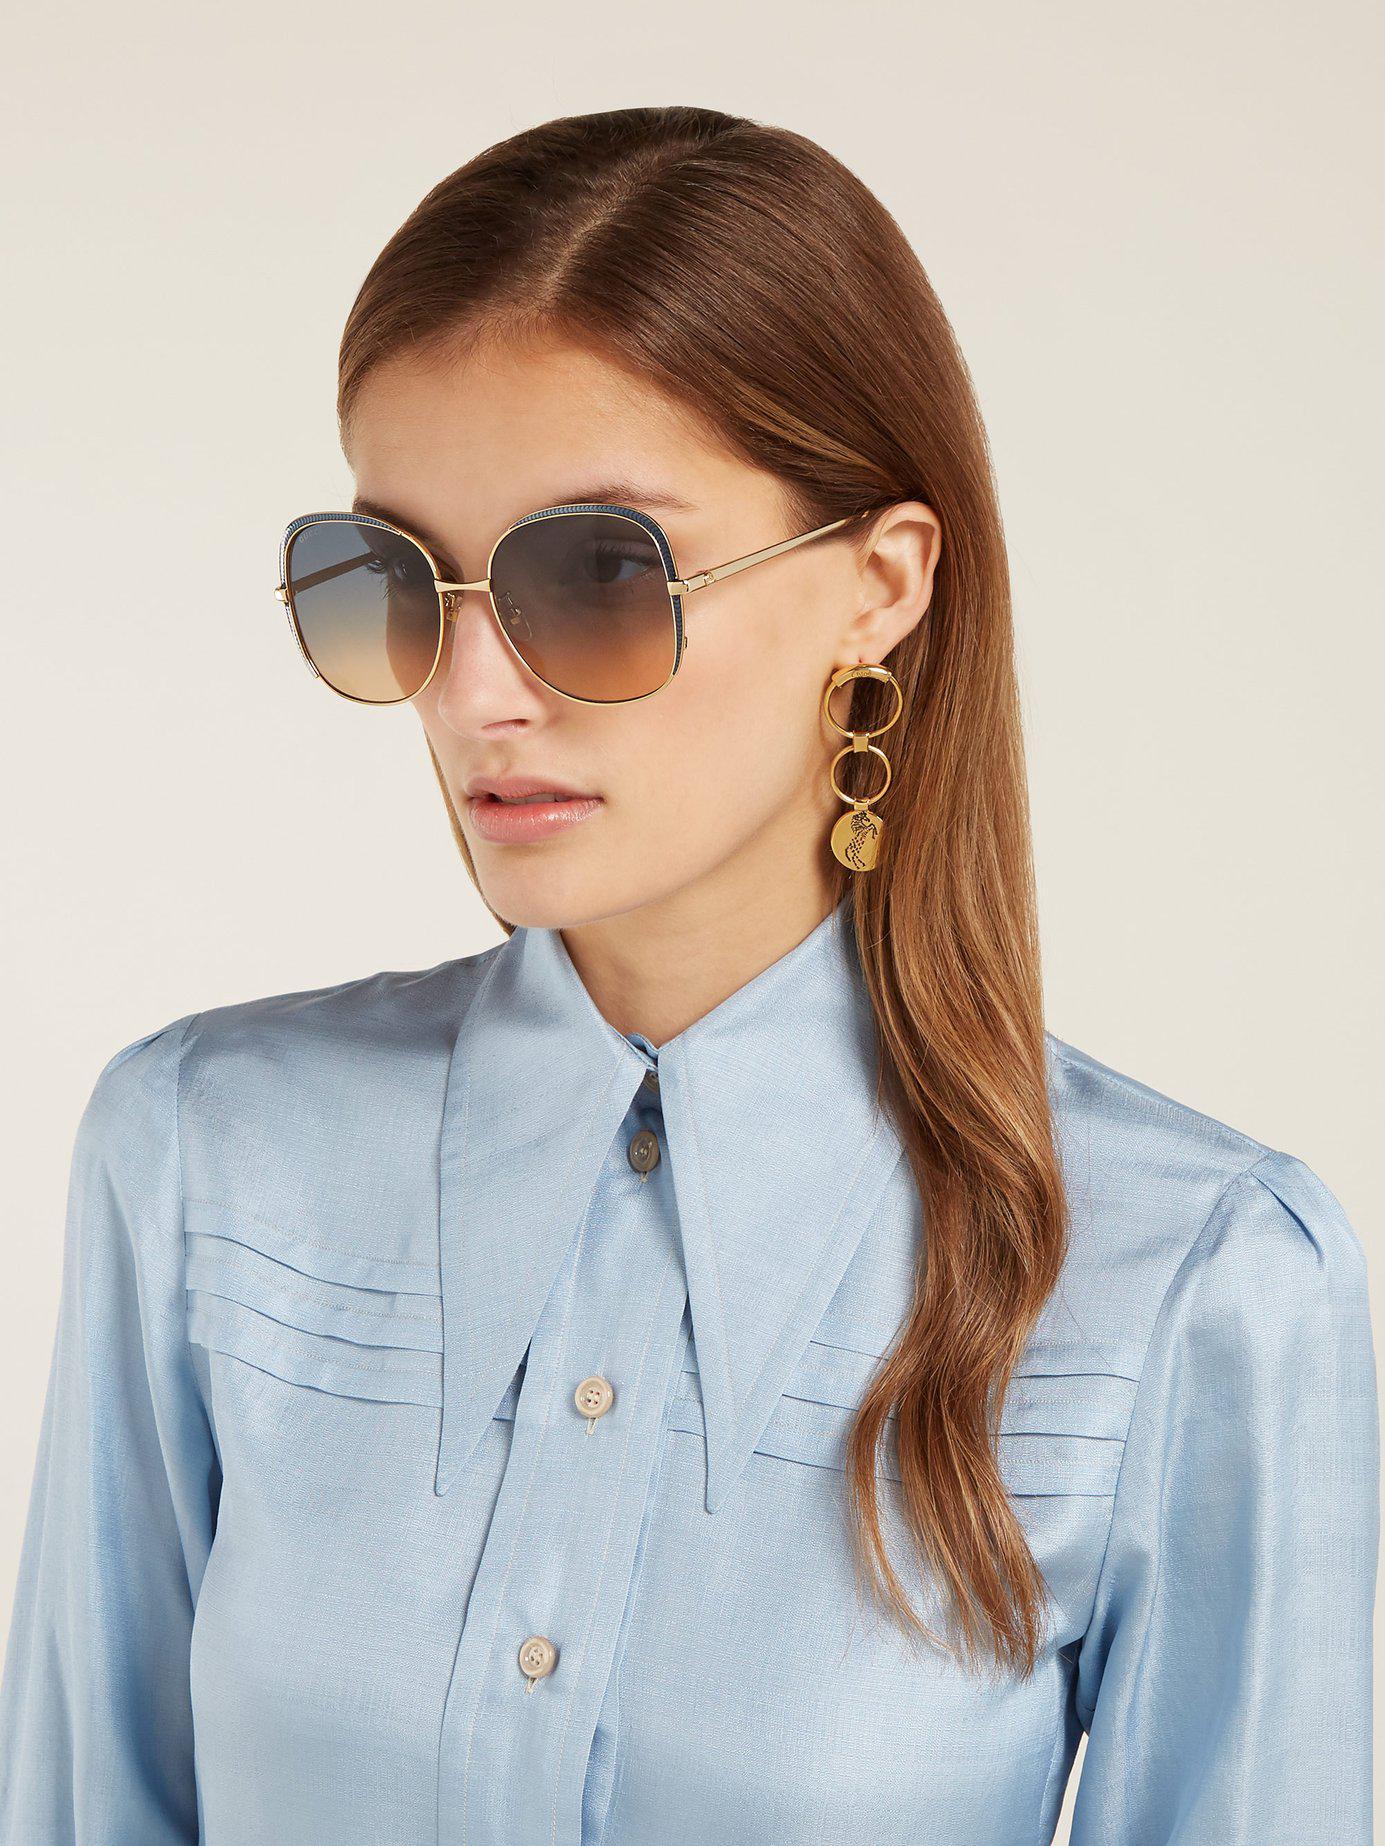 838272ec533 Lyst - Gucci Oversized Square Frame Metal Sunglasses